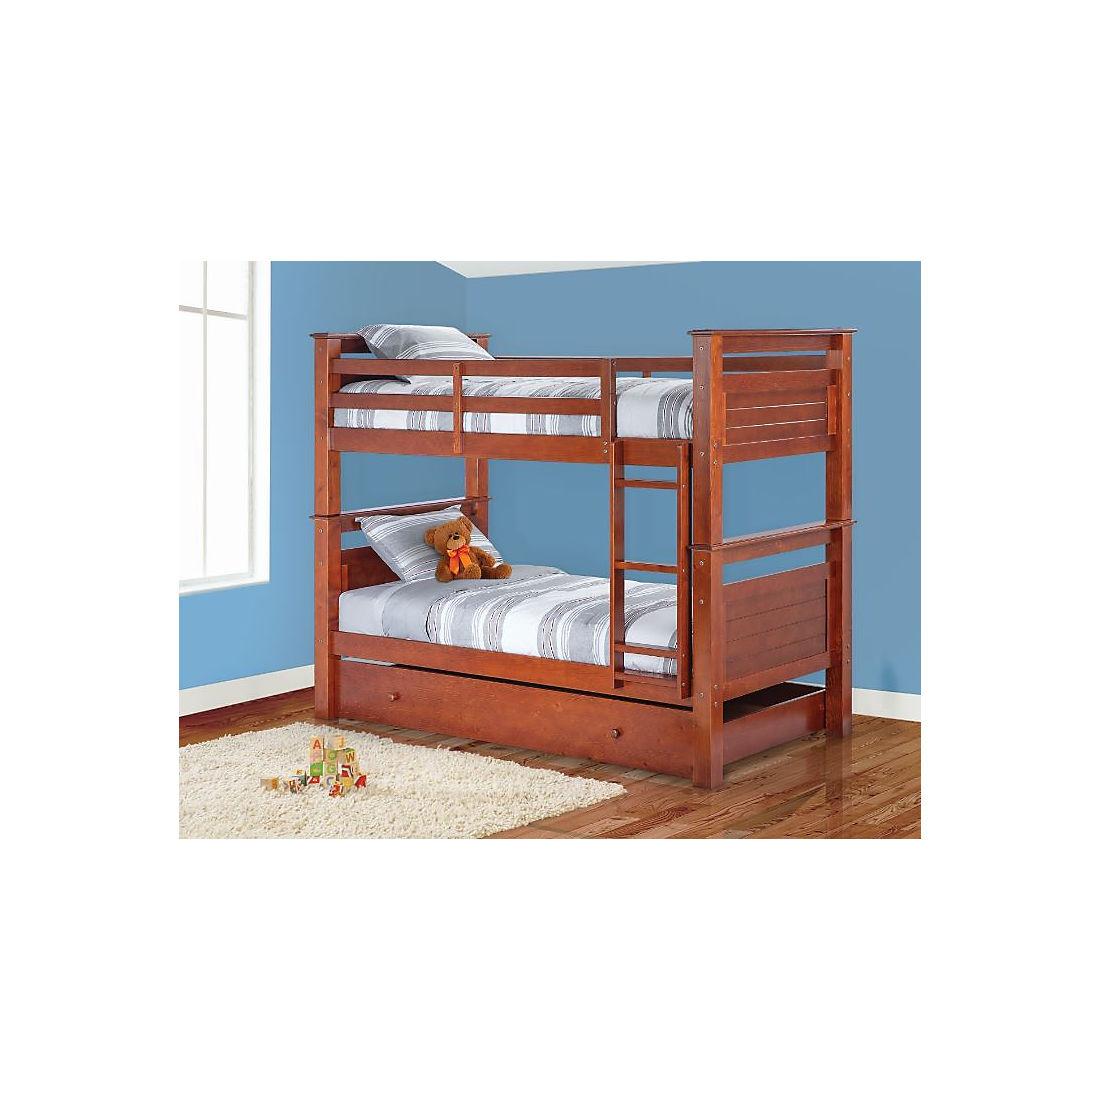 free shipping 0bde3 e1d22 Berkley Jensen Twin Bunk Bed - Walnut